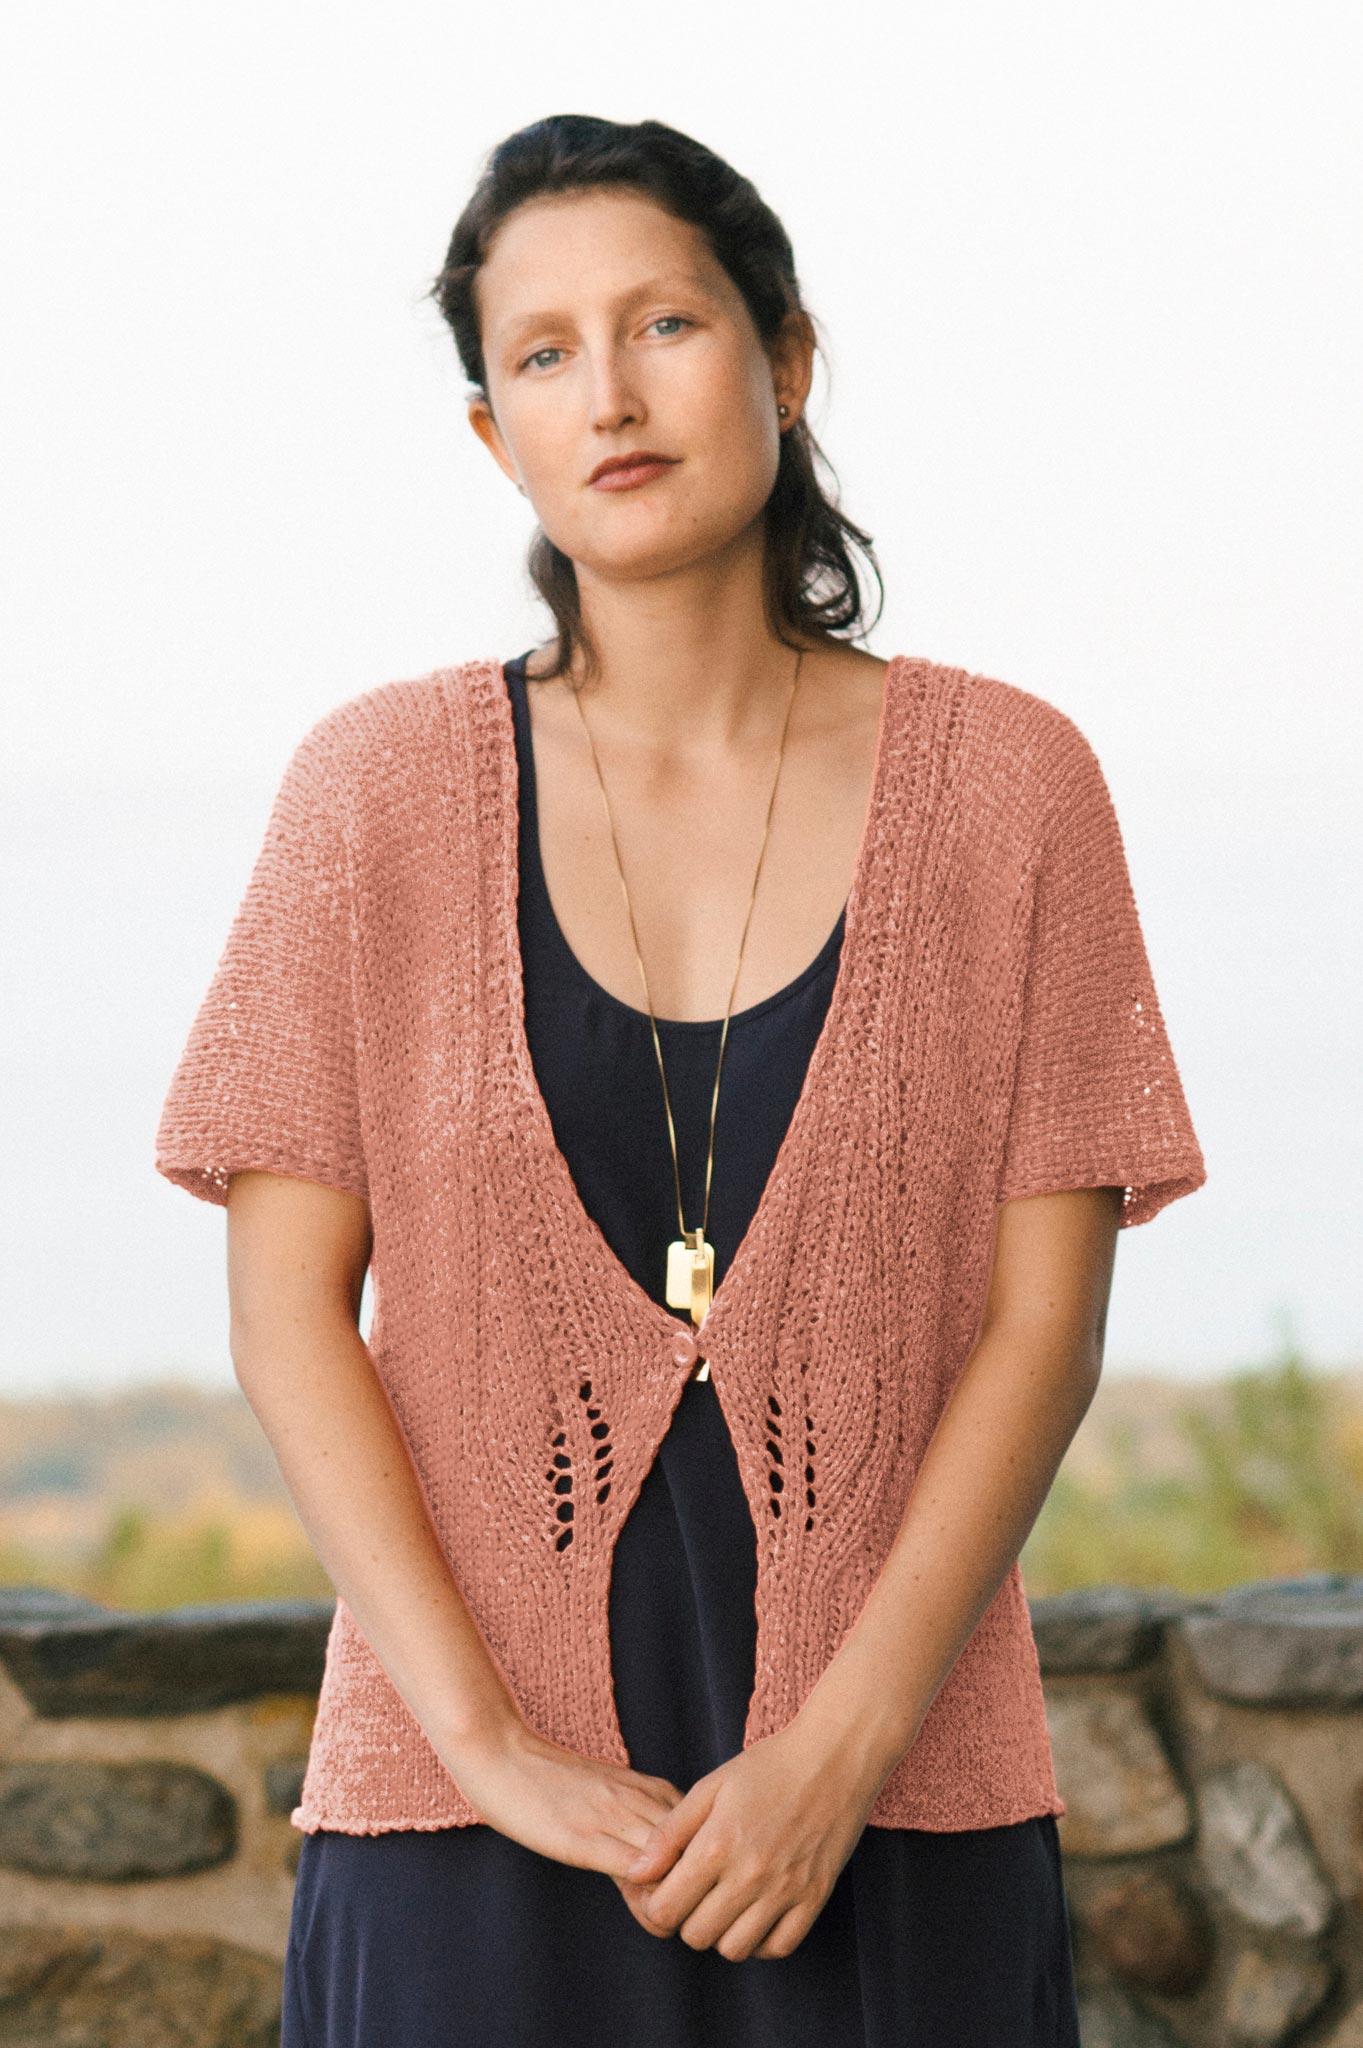 quince-co-bower-norah-gaughan-framework-knitting-pattern-1.jpg